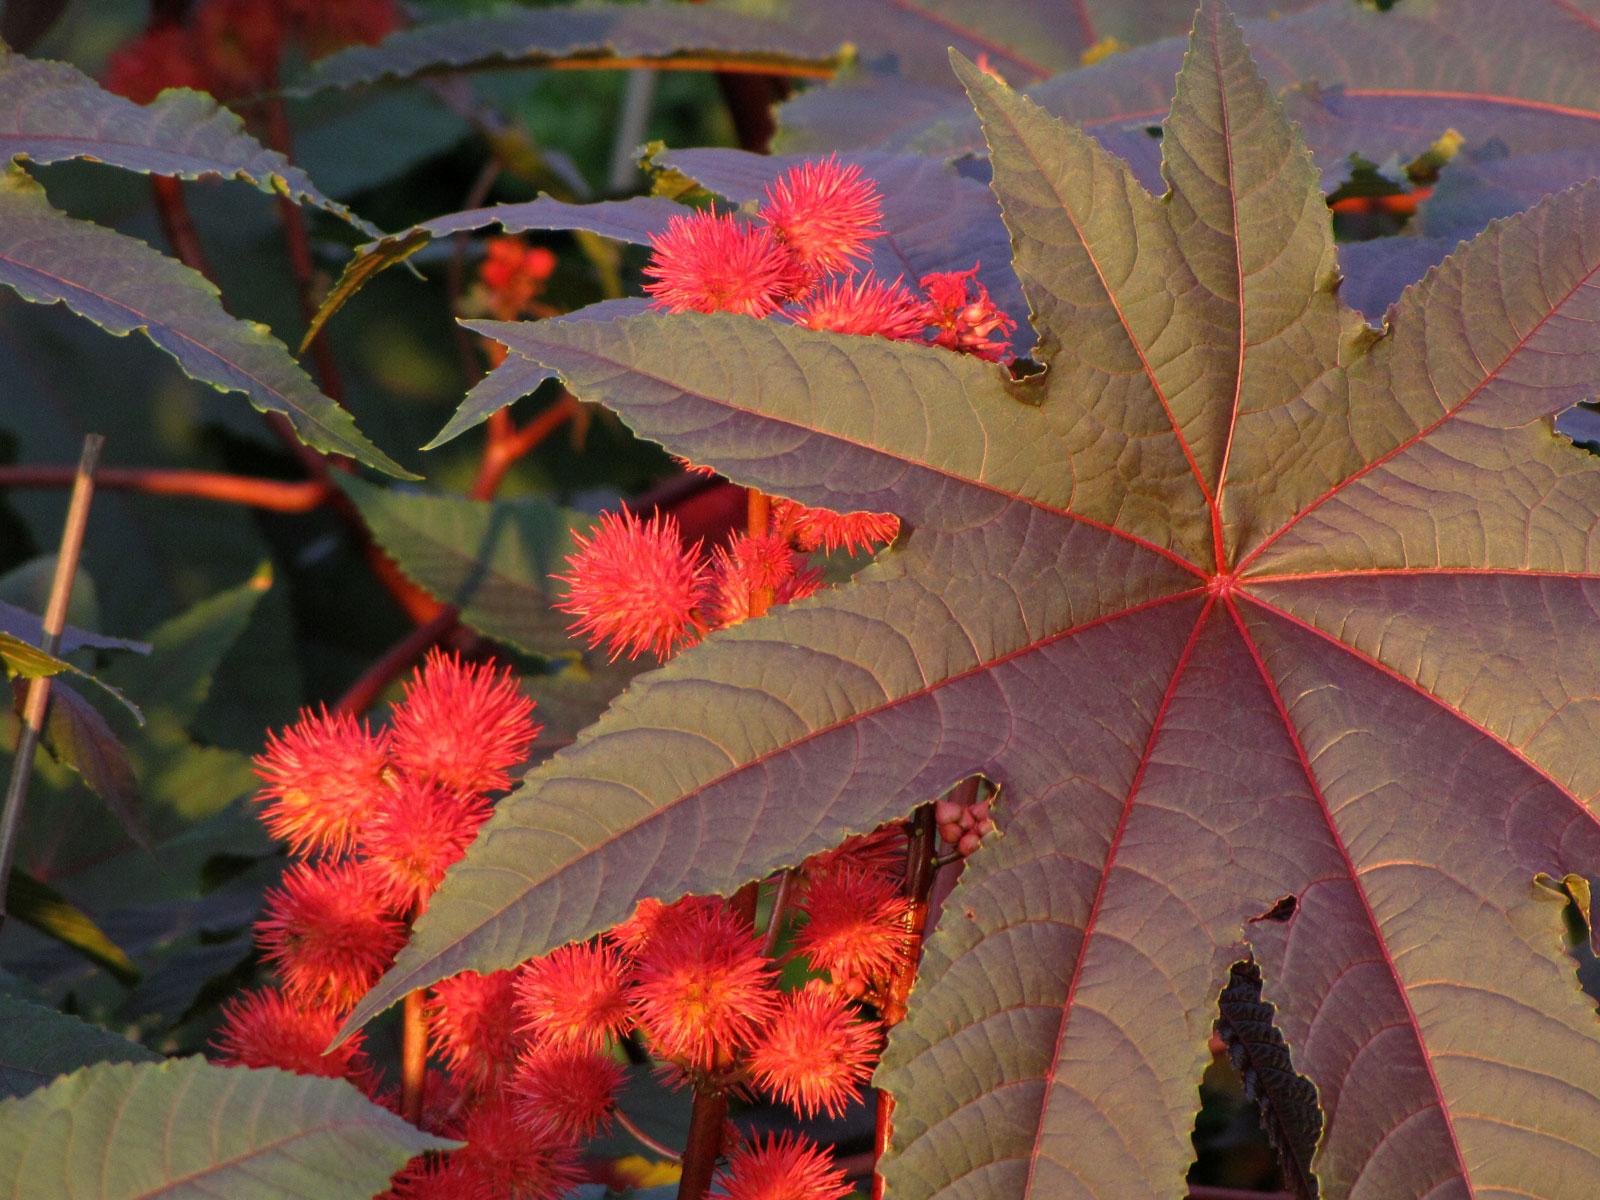 Datei:Castor Oil Plant - Flickr - treegrow.jpg – Wikipedia